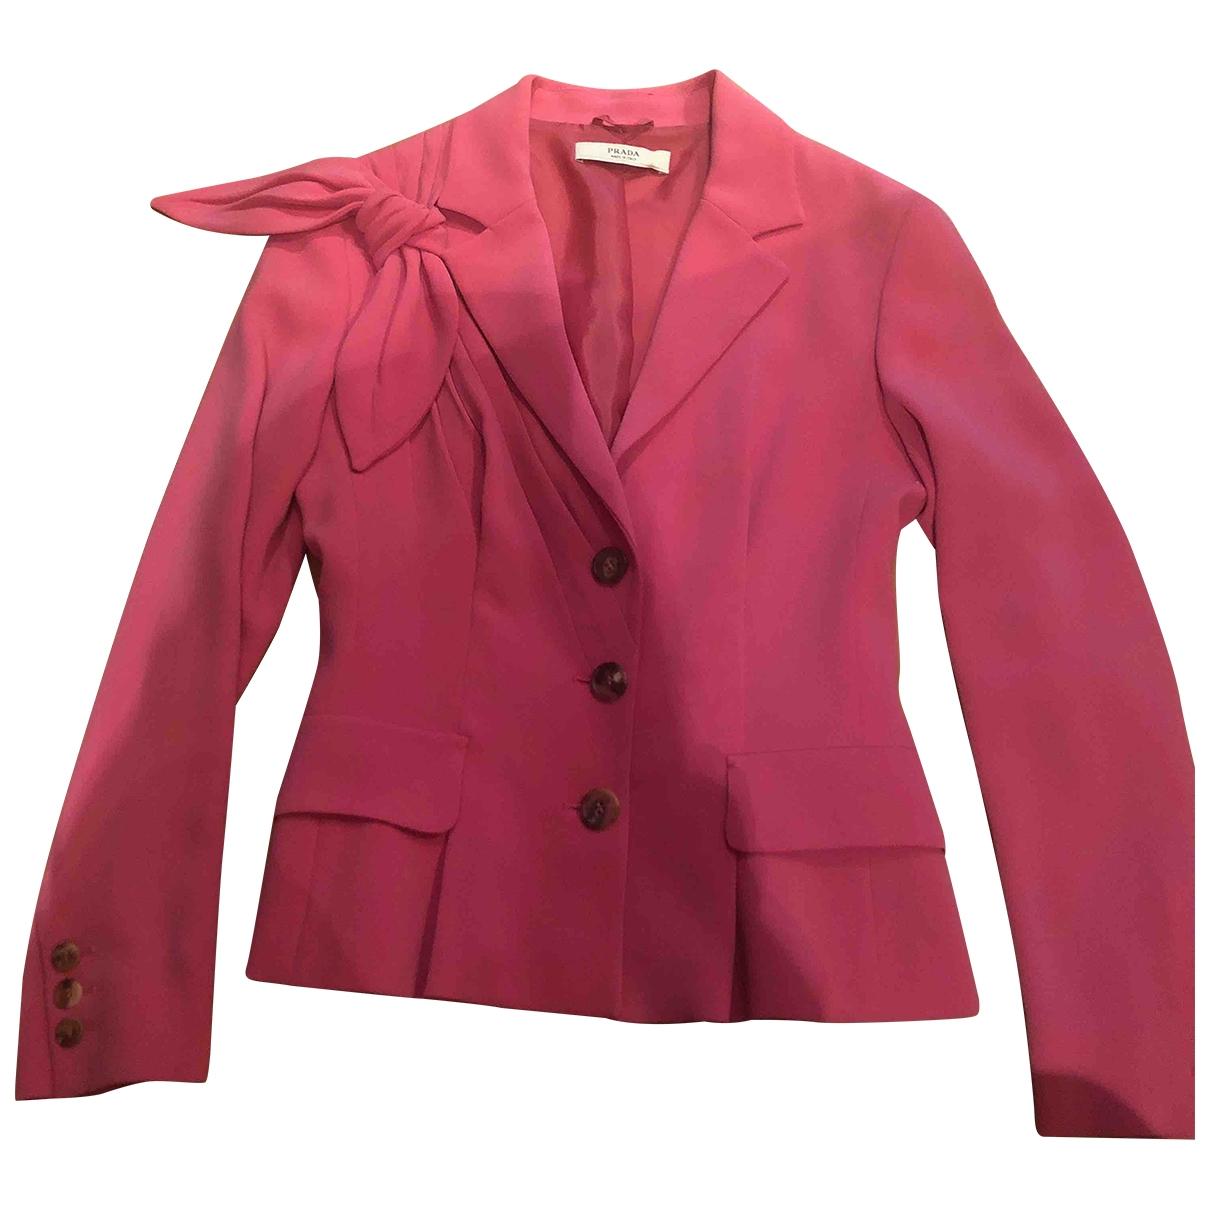 Prada \N Pink jacket for Women 40 IT